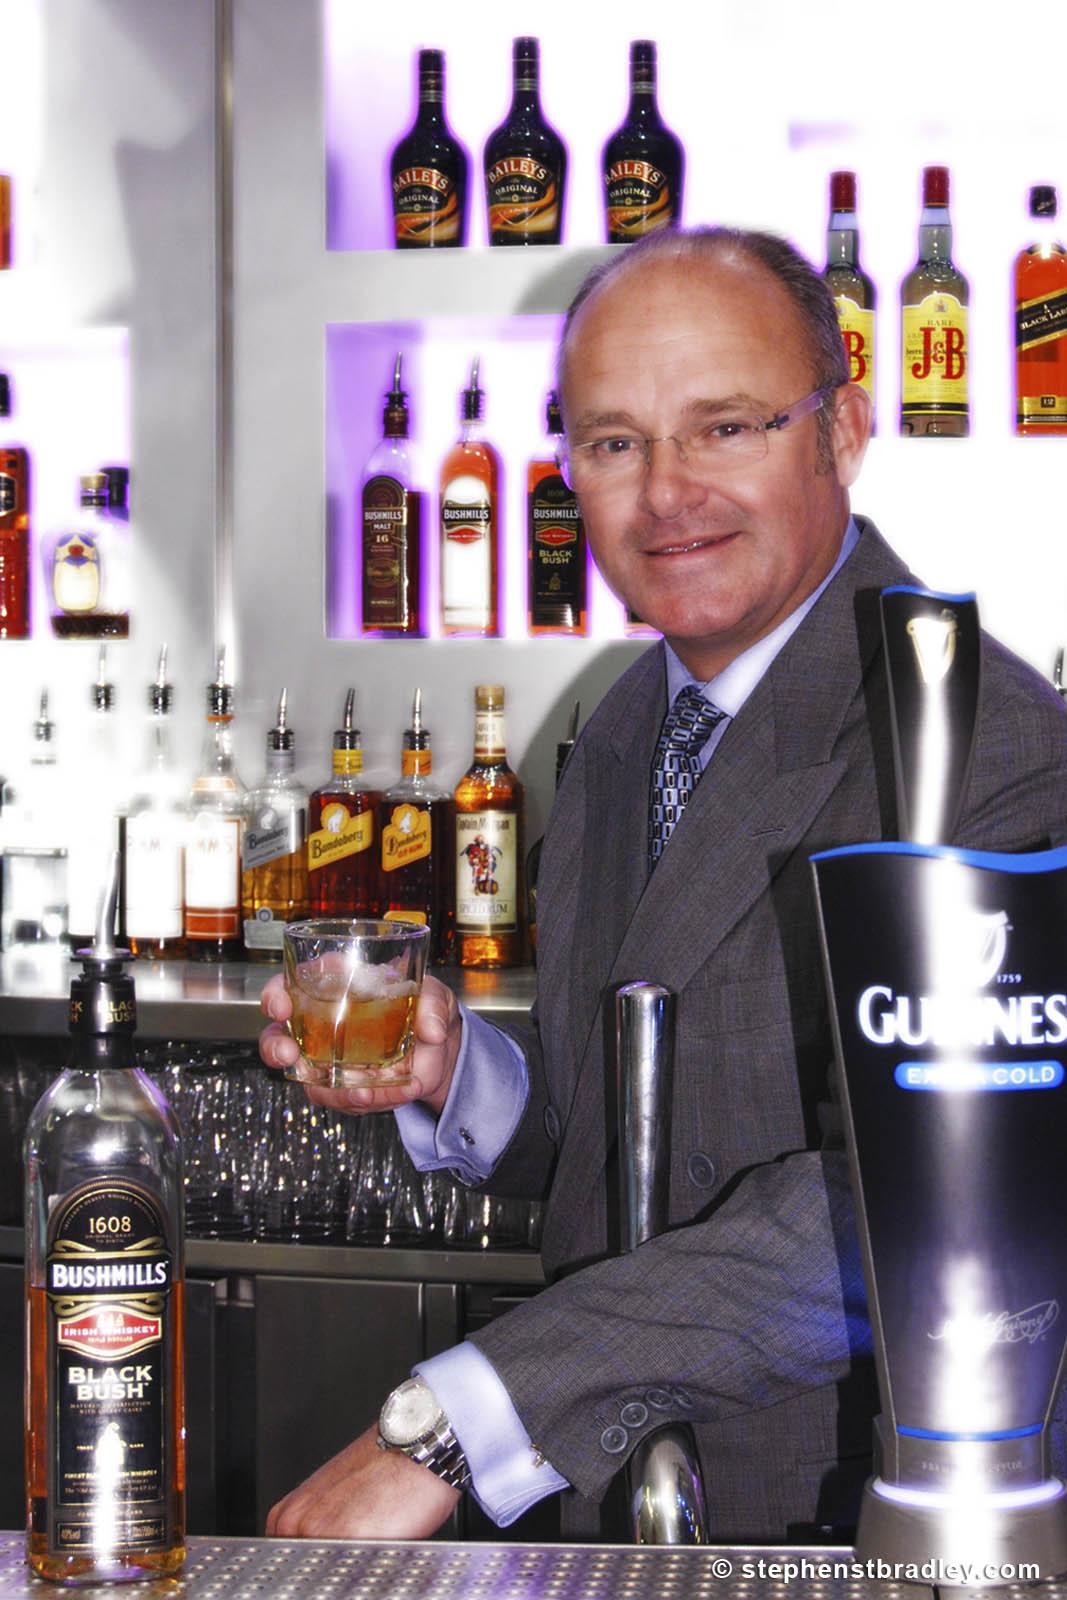 PR Photographer Dublin Ireland portfolio photo of former Diageo CEO Paul Walsh - photo 2260 by Stephen T Bradley PR photography and video production services Dublin, Ireland